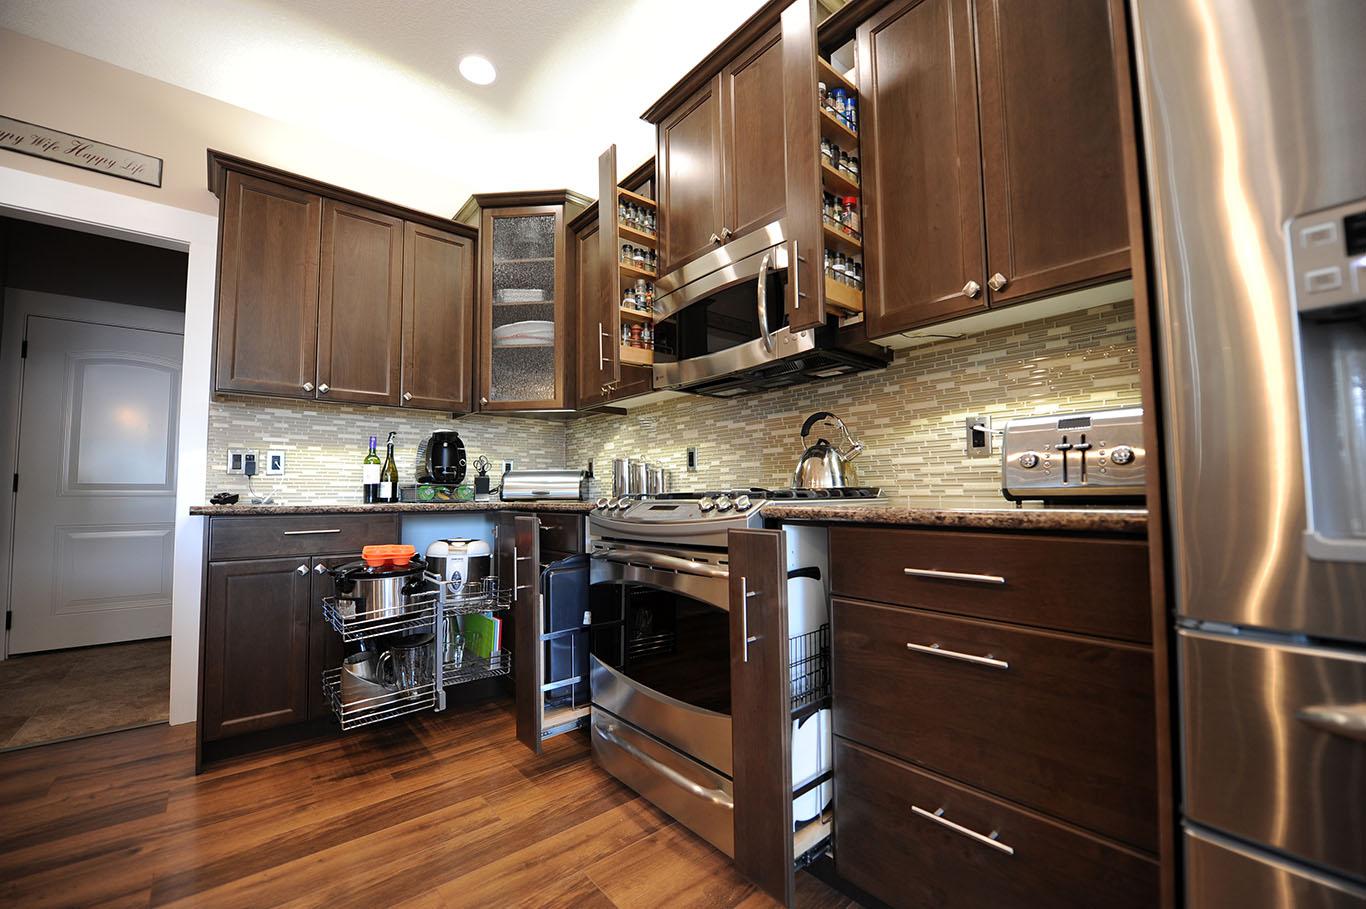 kitchen_cabinetry_028.jpg